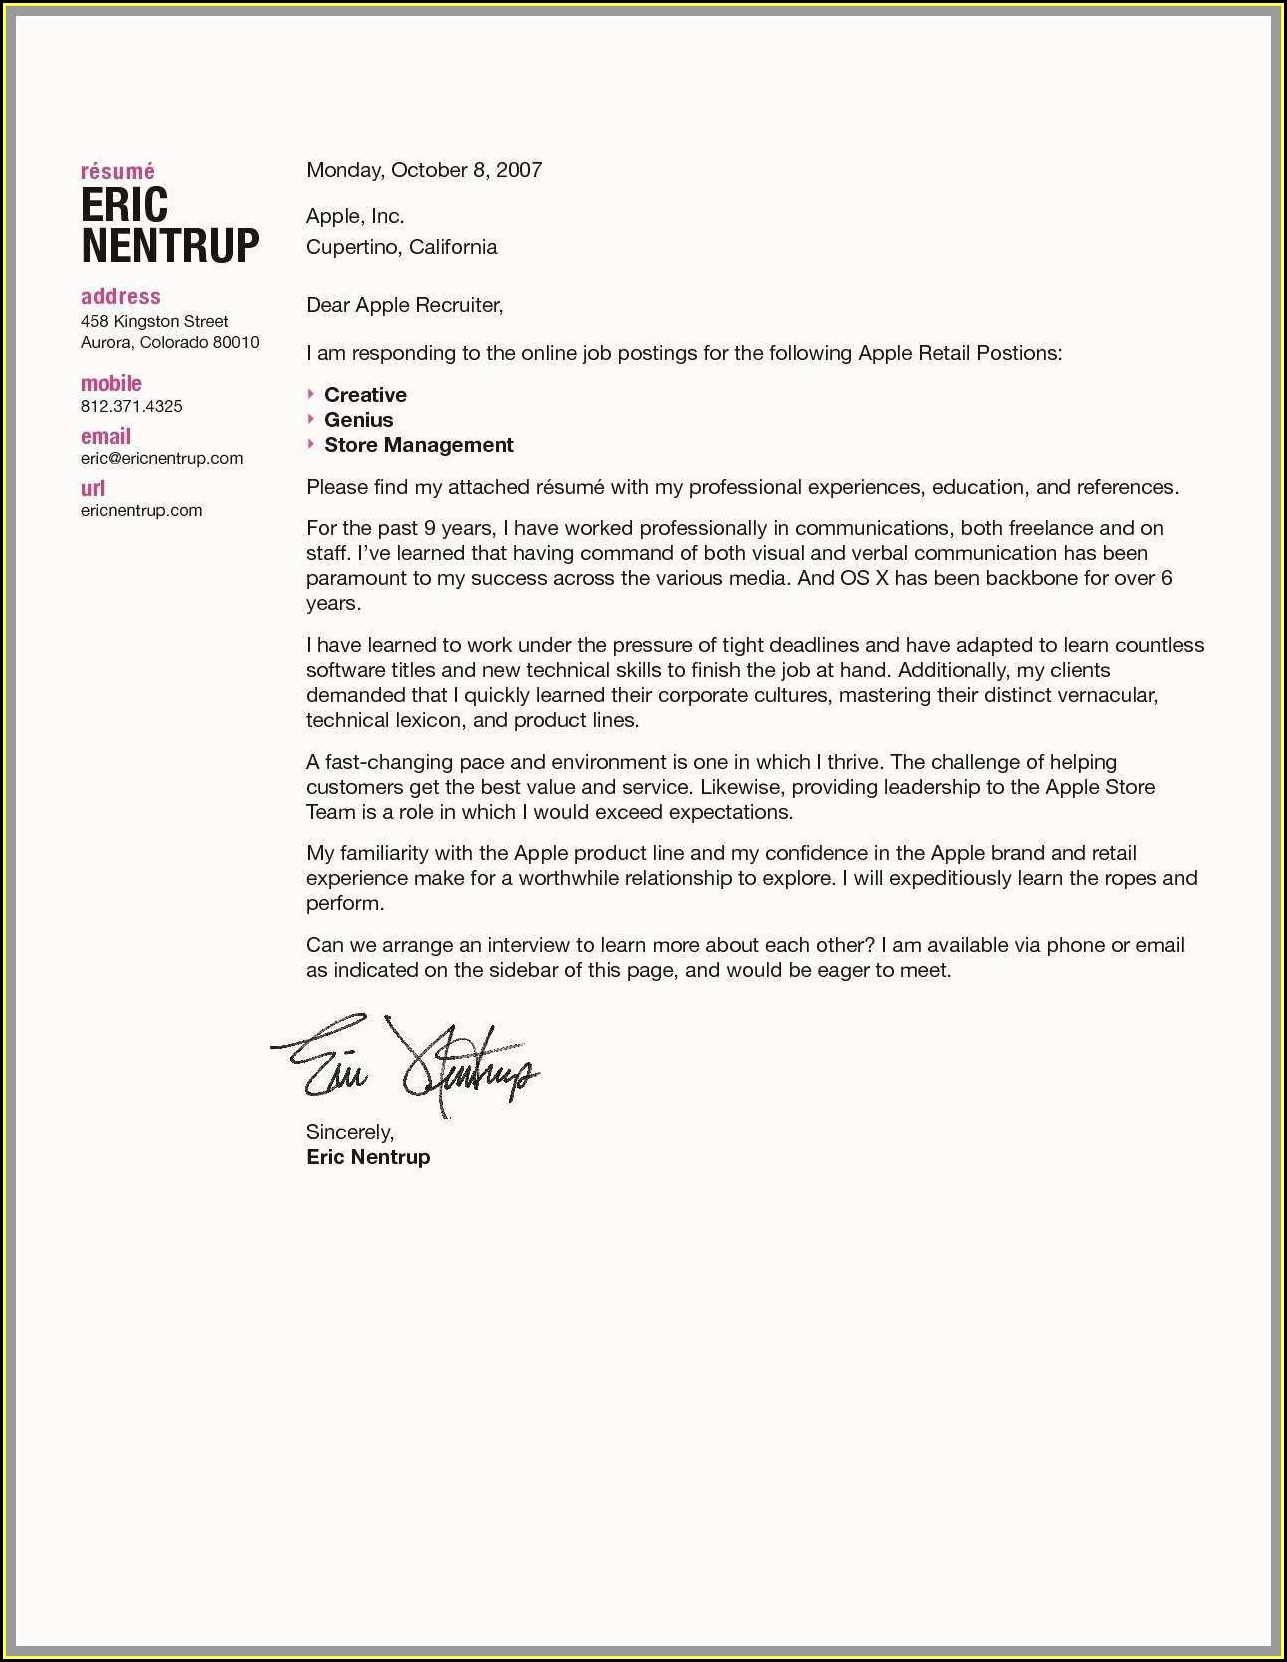 Capstone Resume Services Reviews